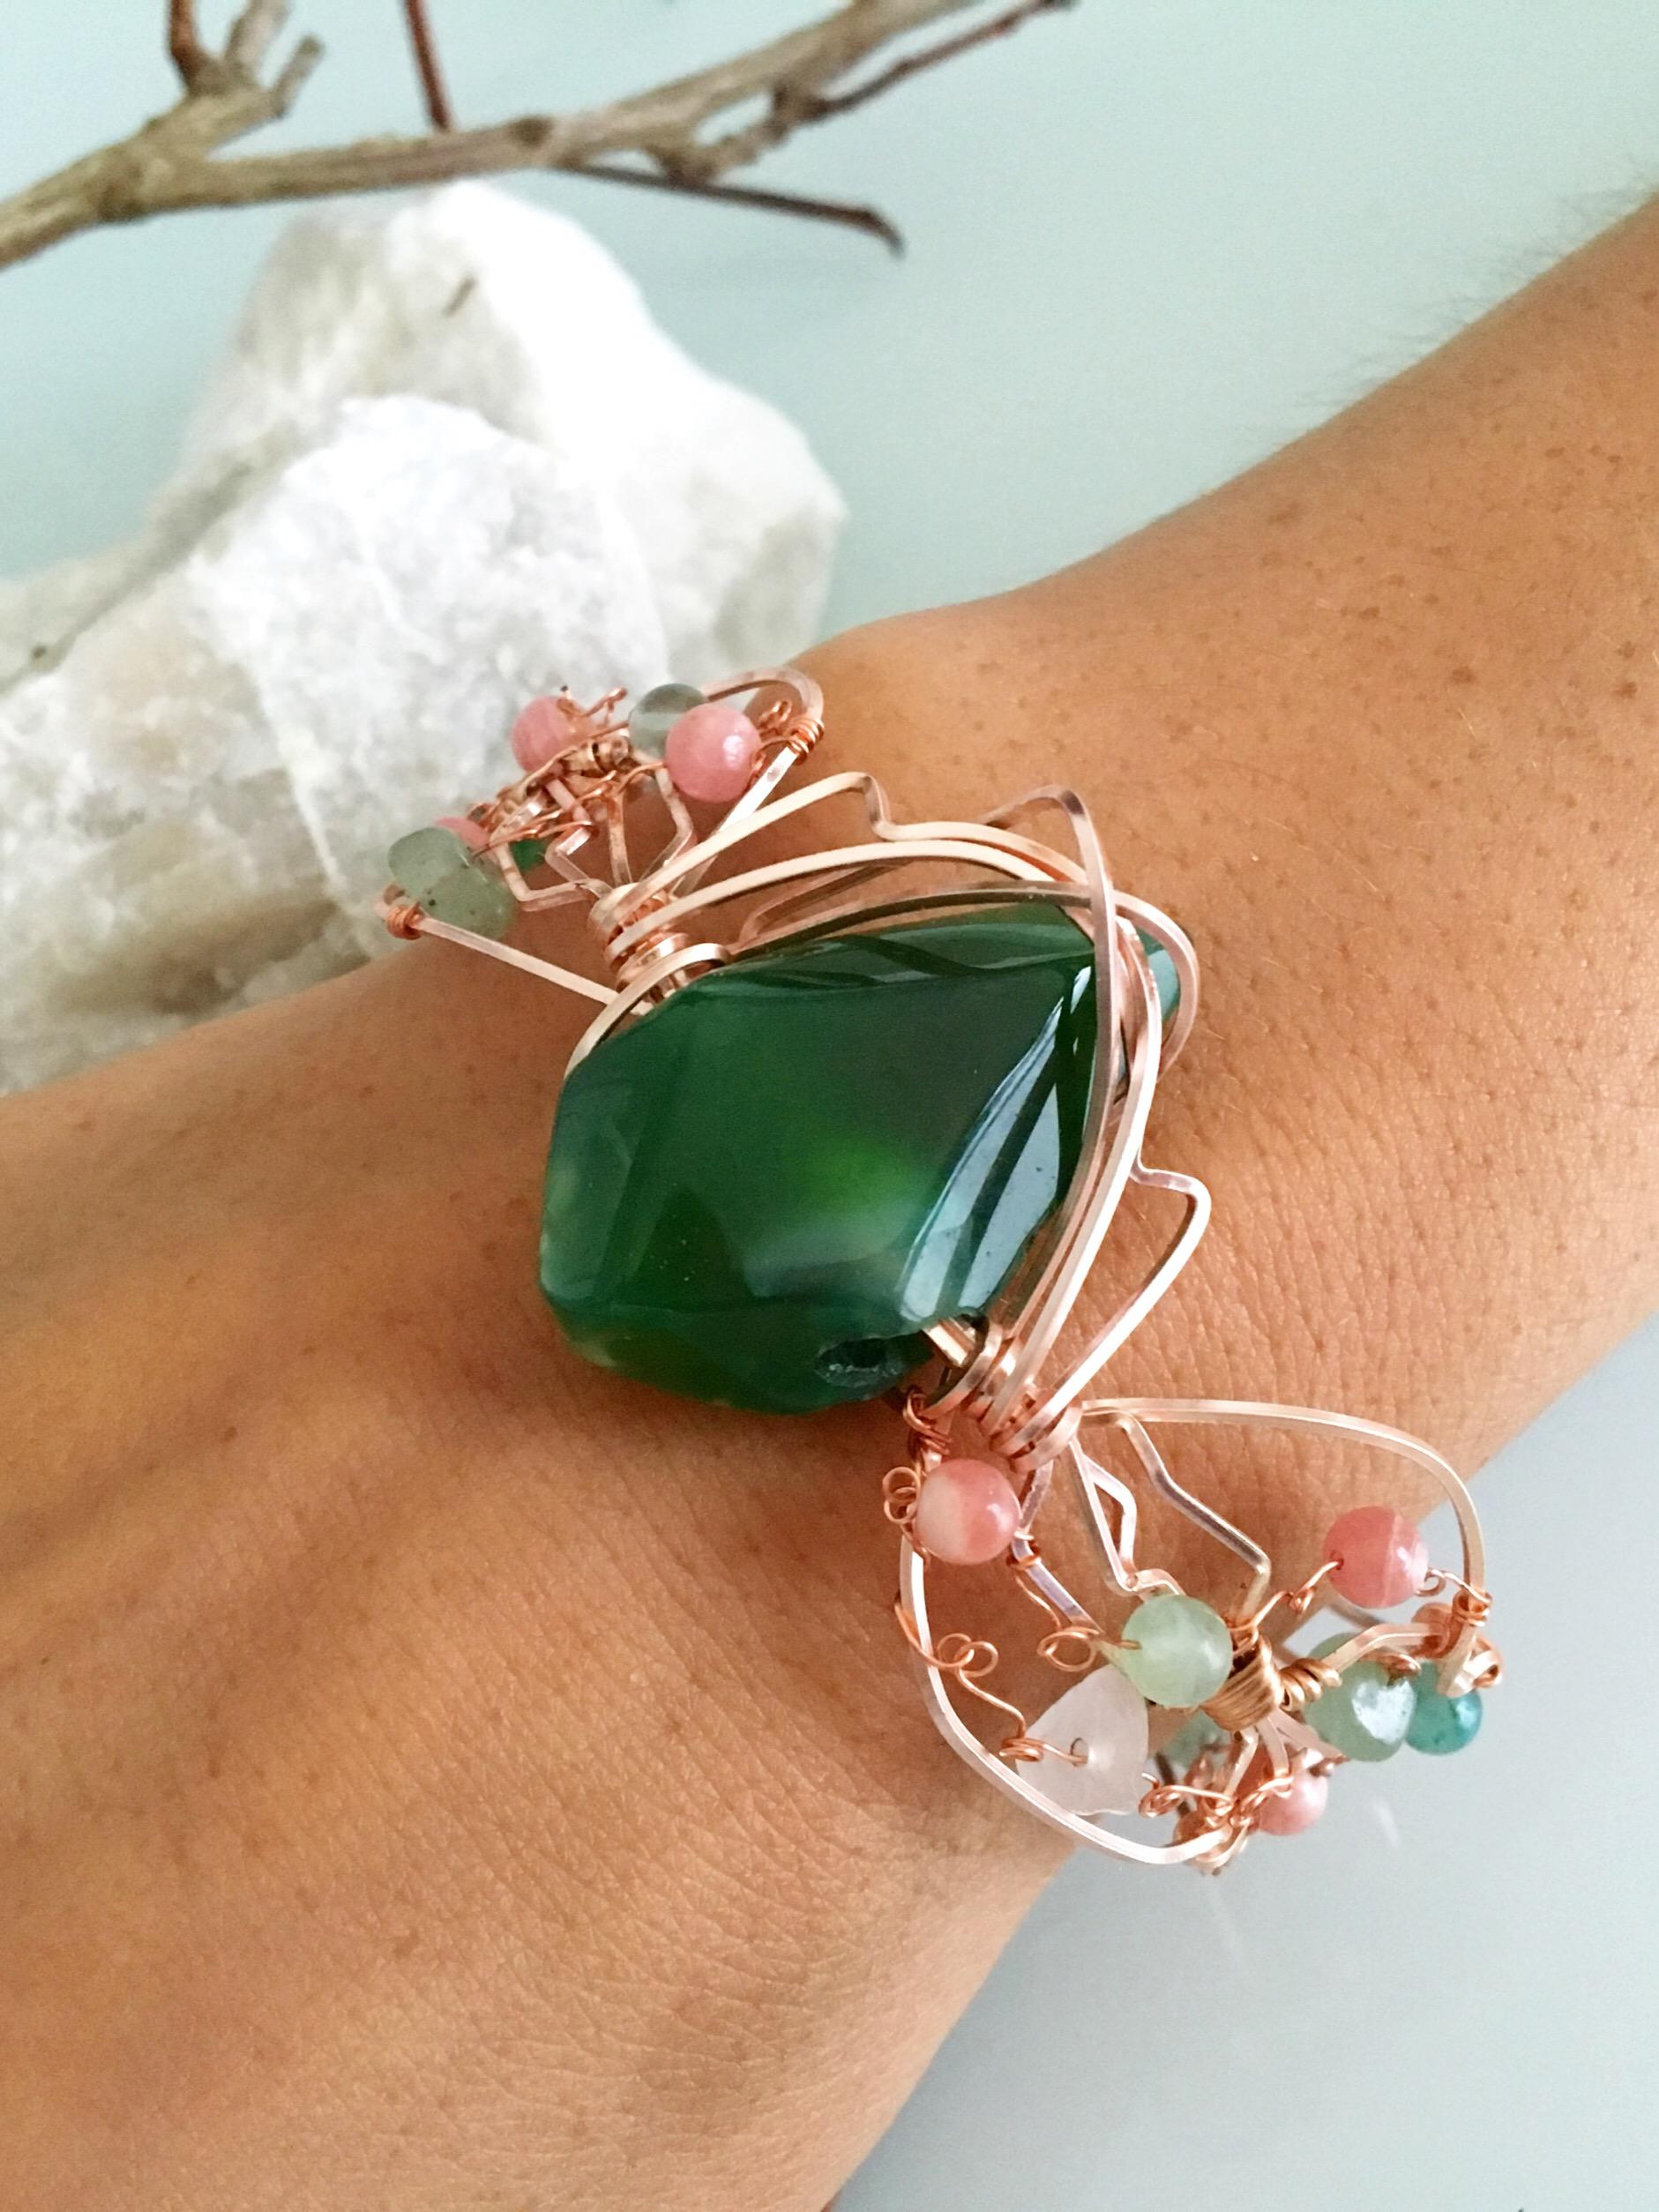 Qhresnna Quartz Bracelet - Green Agathe aventurine and Rhodocrosite - Silver Plated